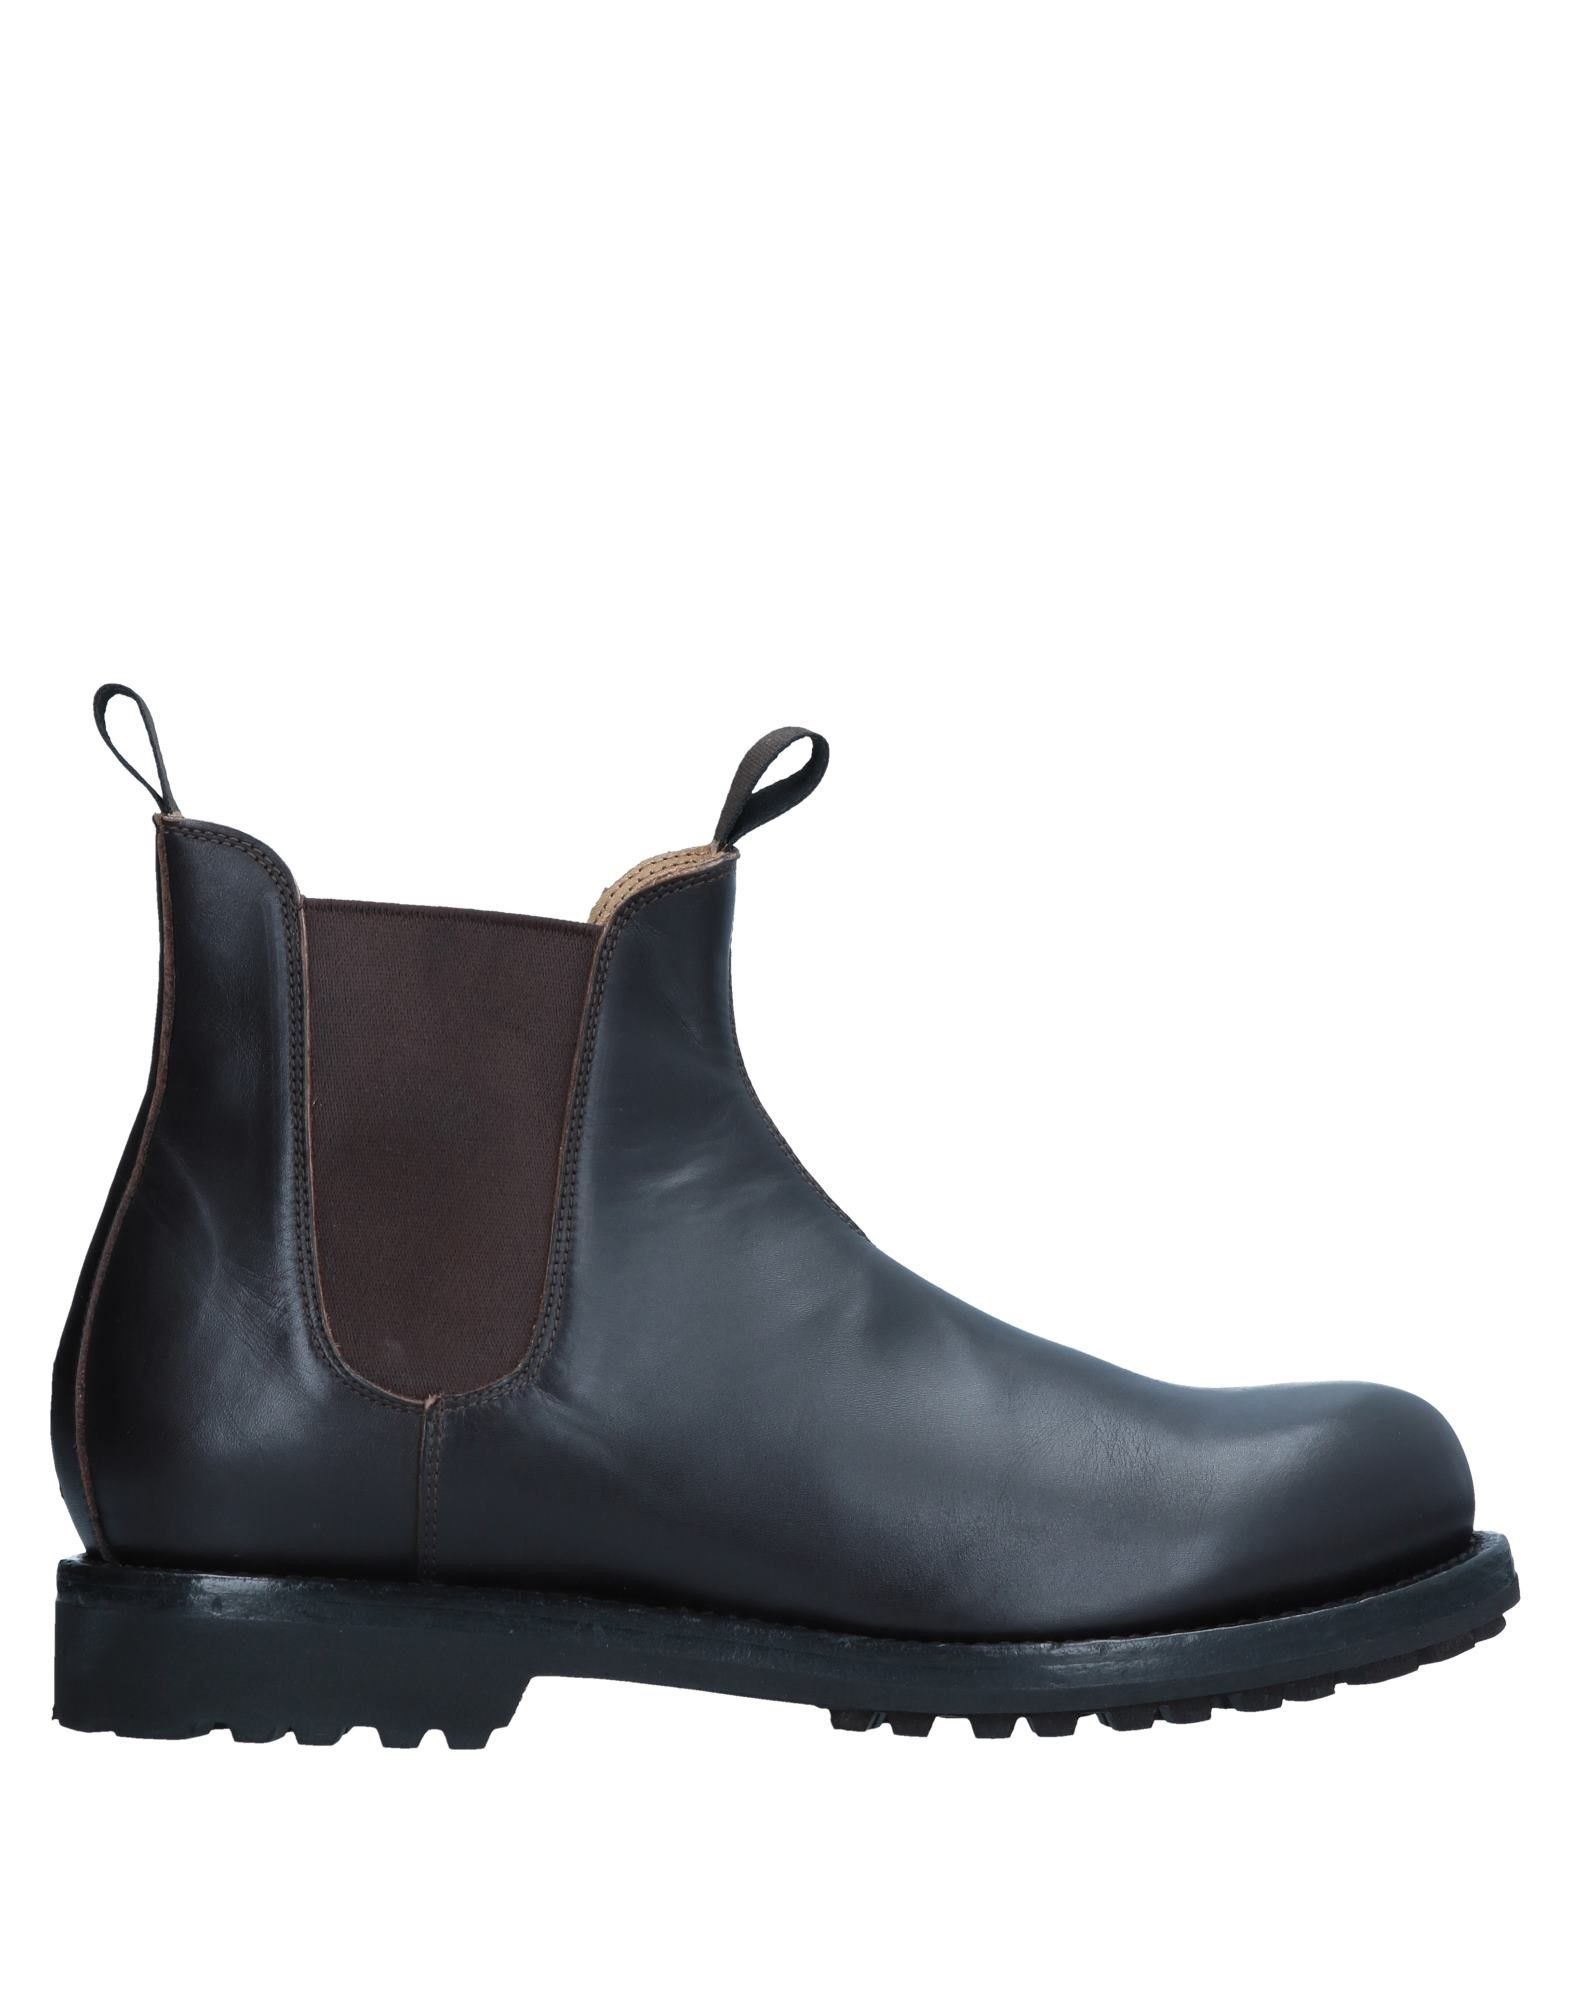 Buttero® Boots - Men Buttero® Australia Boots online on  Australia Buttero® - 11544201WU 8a5159